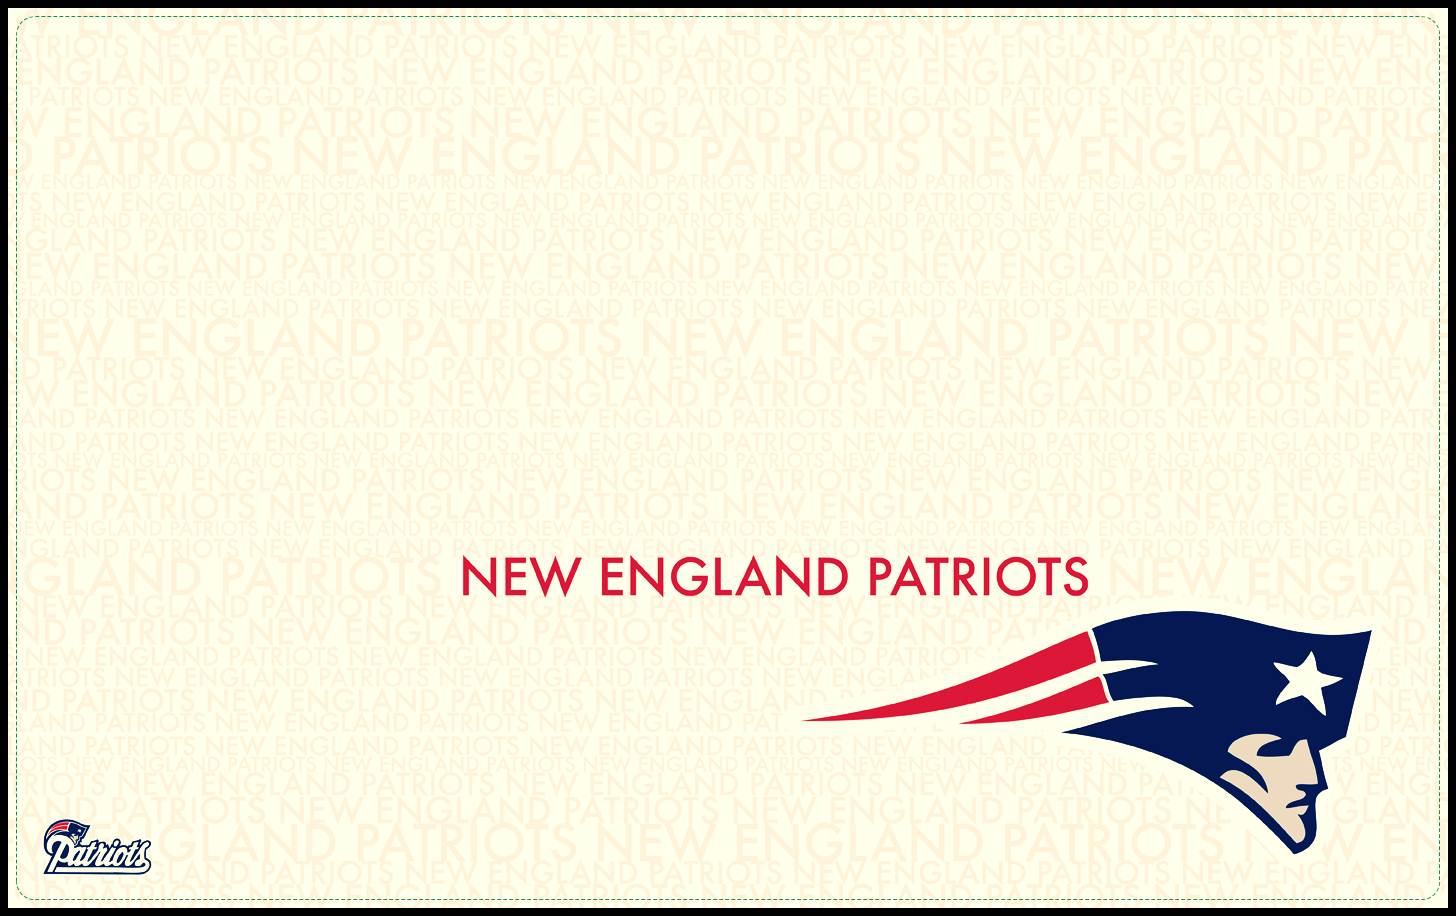 http://1.bp.blogspot.com/-9aOofOOVsA8/UL9iYZiPnYI/AAAAAAAABVc/MSKlSG7P838/s1600/New-England-Patriots-Wallpaper-001.jpg